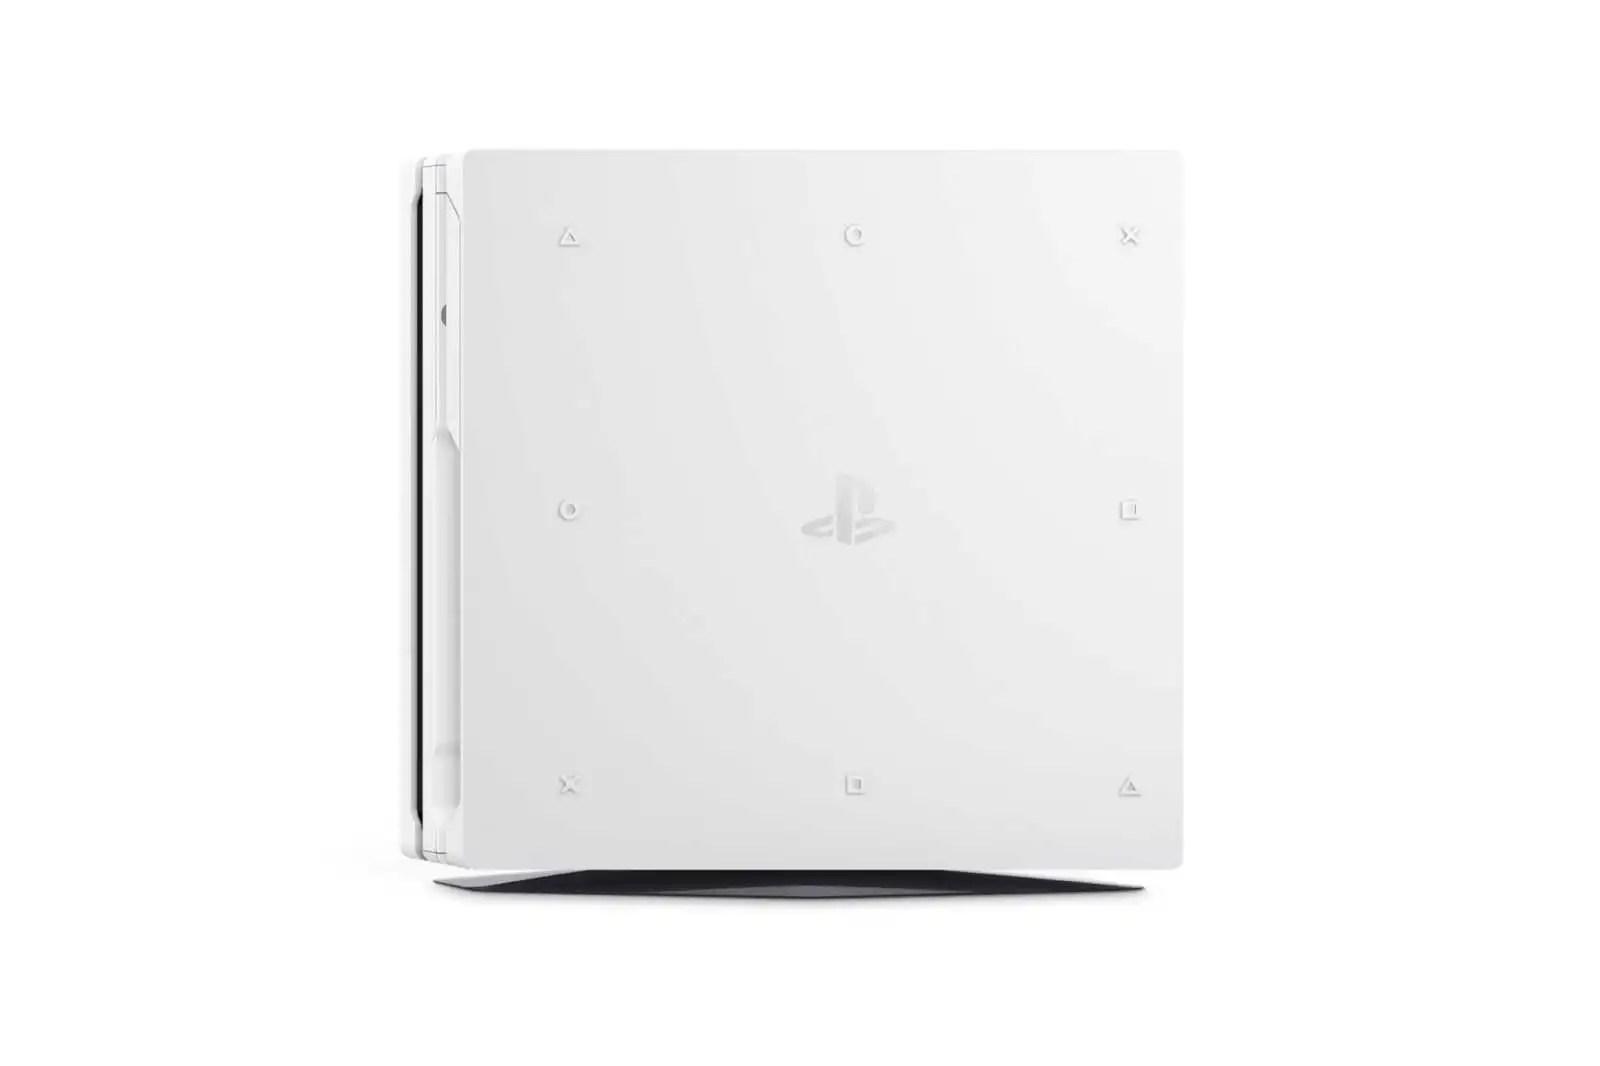 Destiny 2: in arrivo un bundle con PS4 Pro